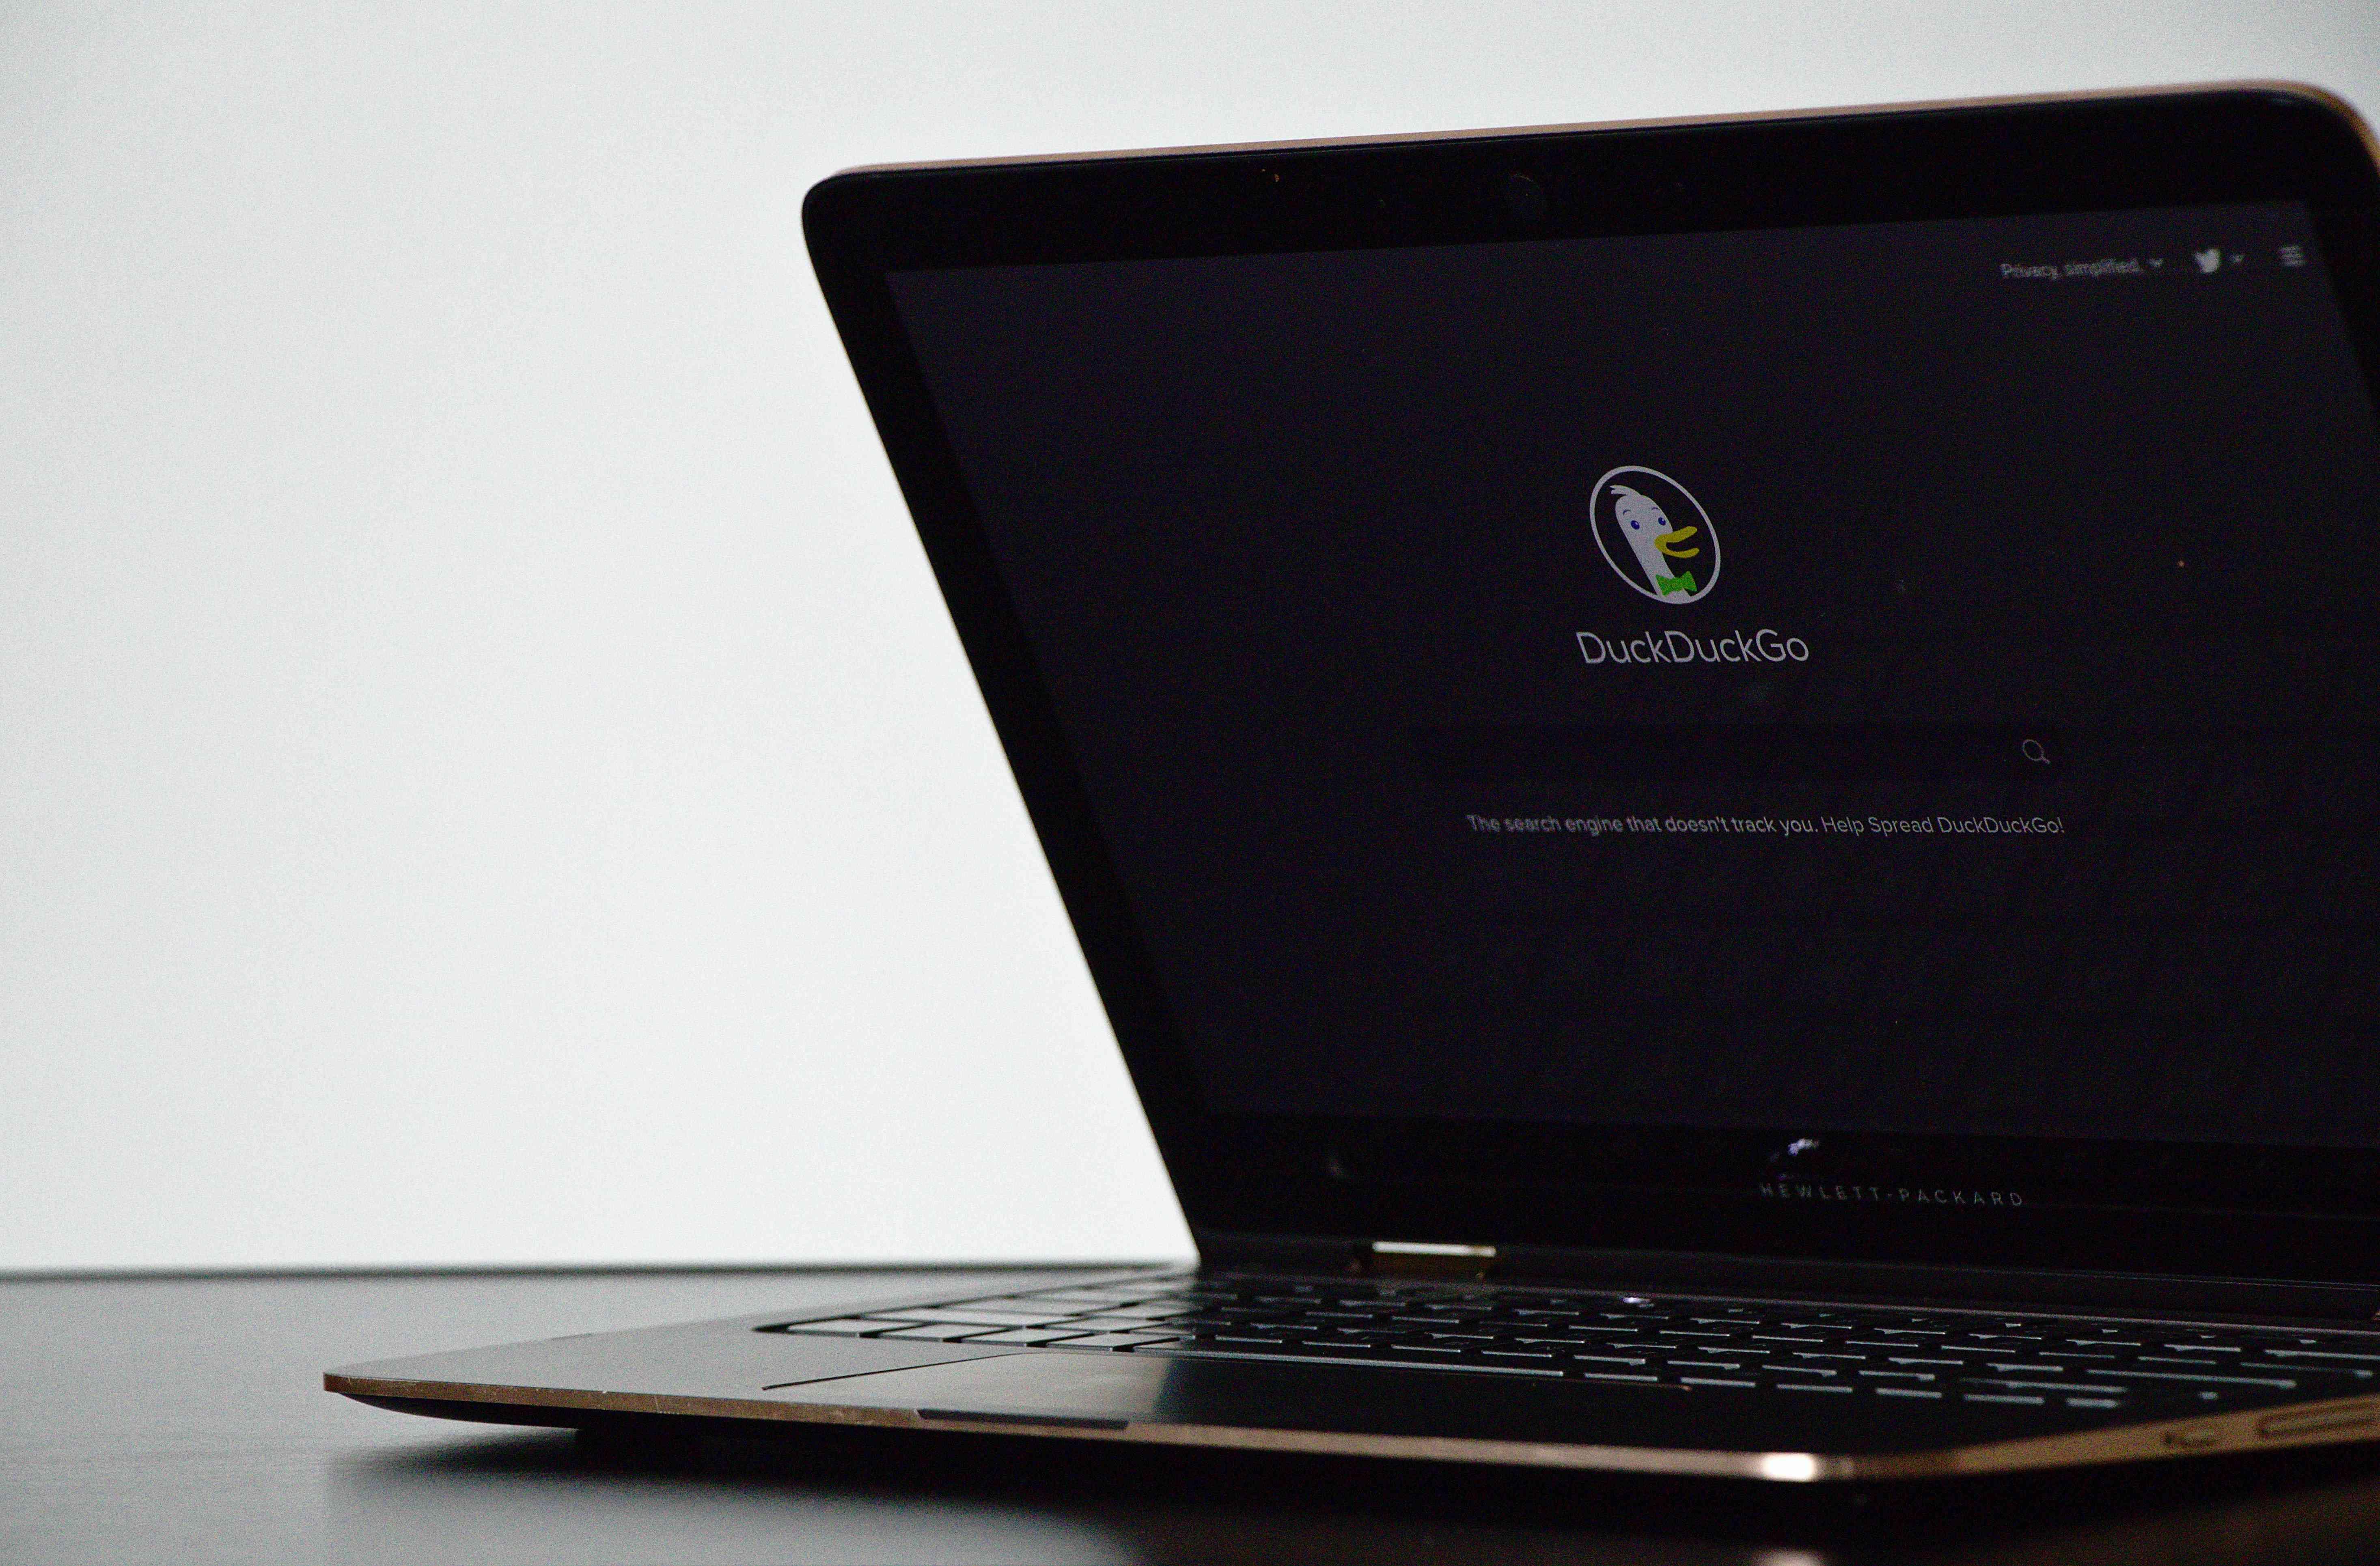 DuckDuckGo search engine on laptop.